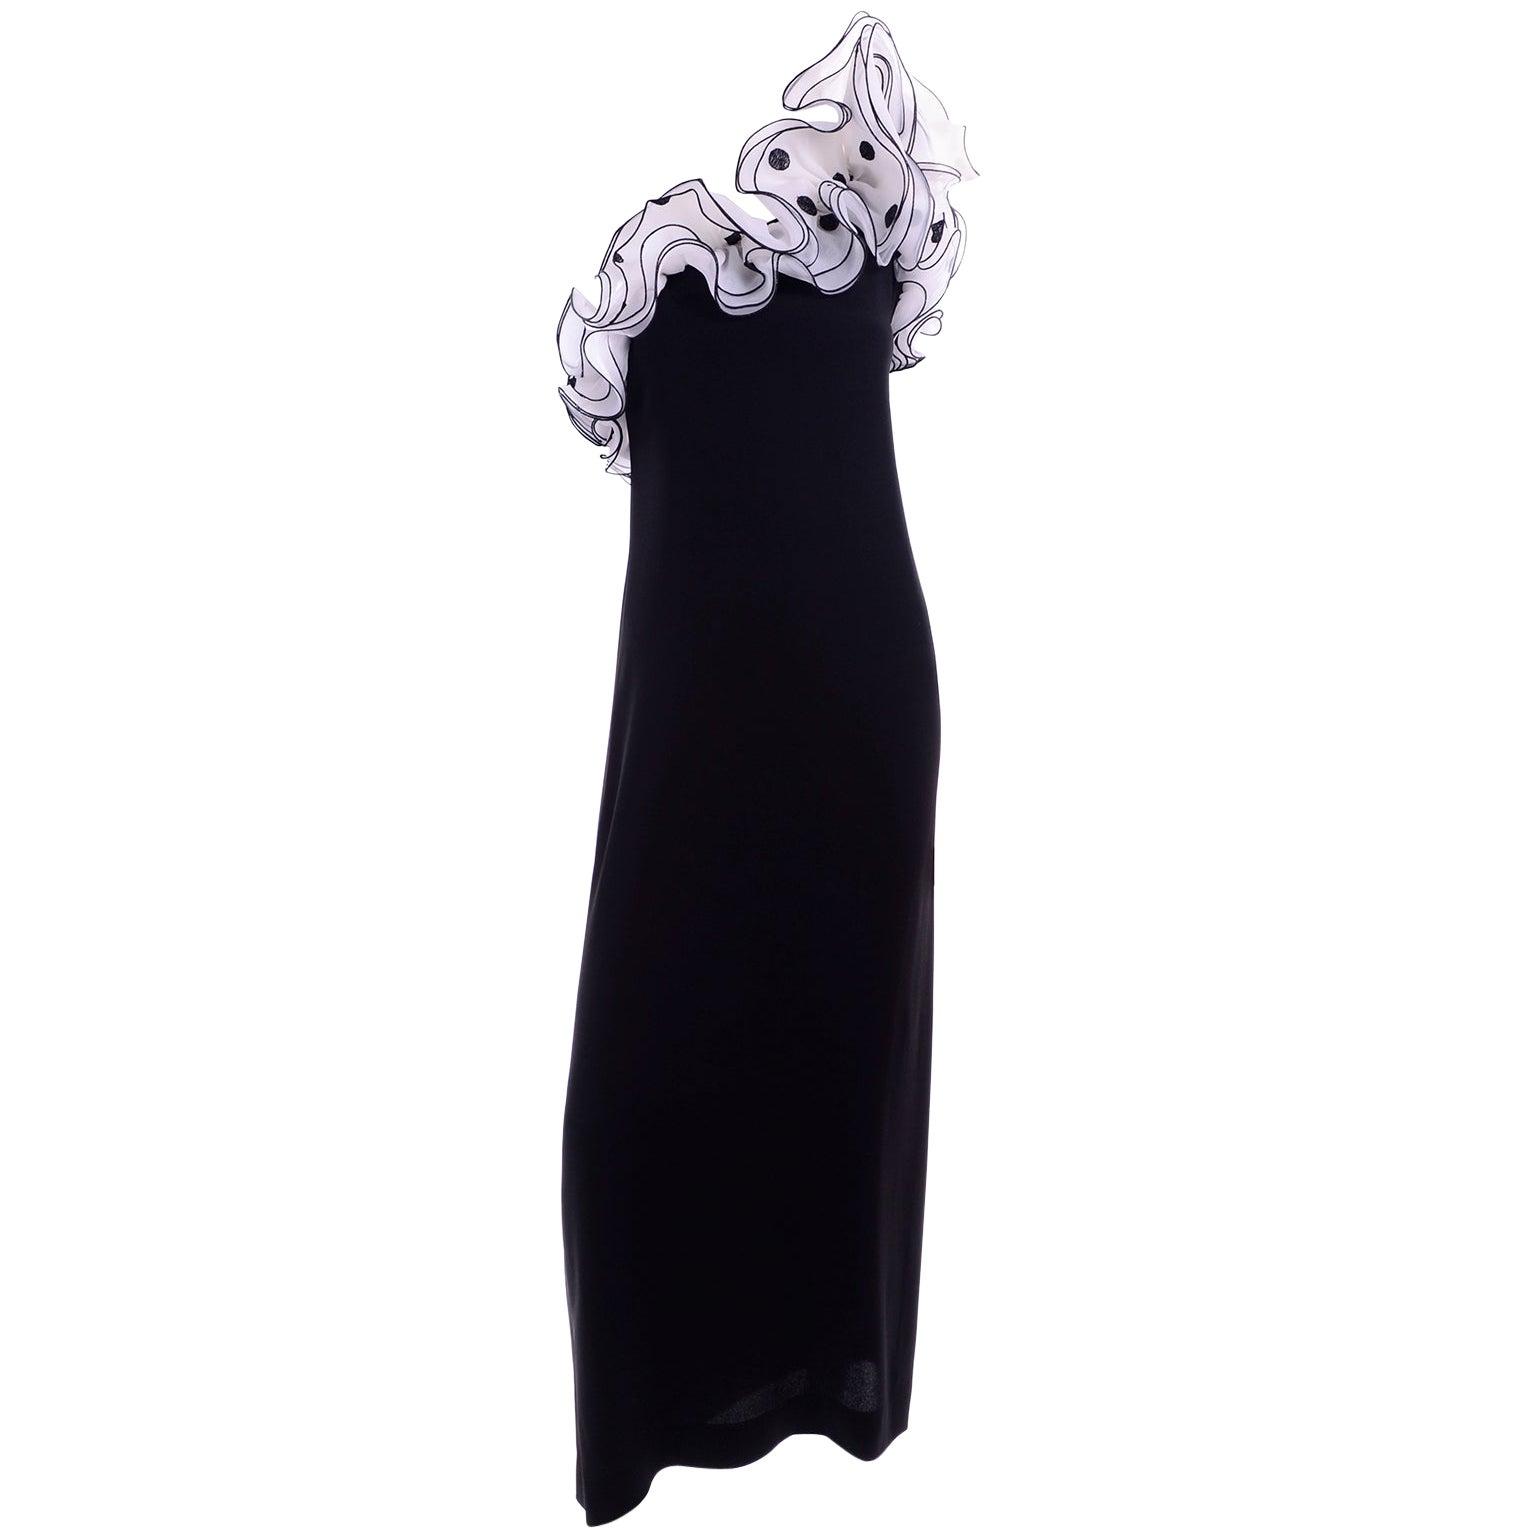 1970s Victor Costa Vintage Long Black Evening Dress W/ Polka Dot Organza Ruffles